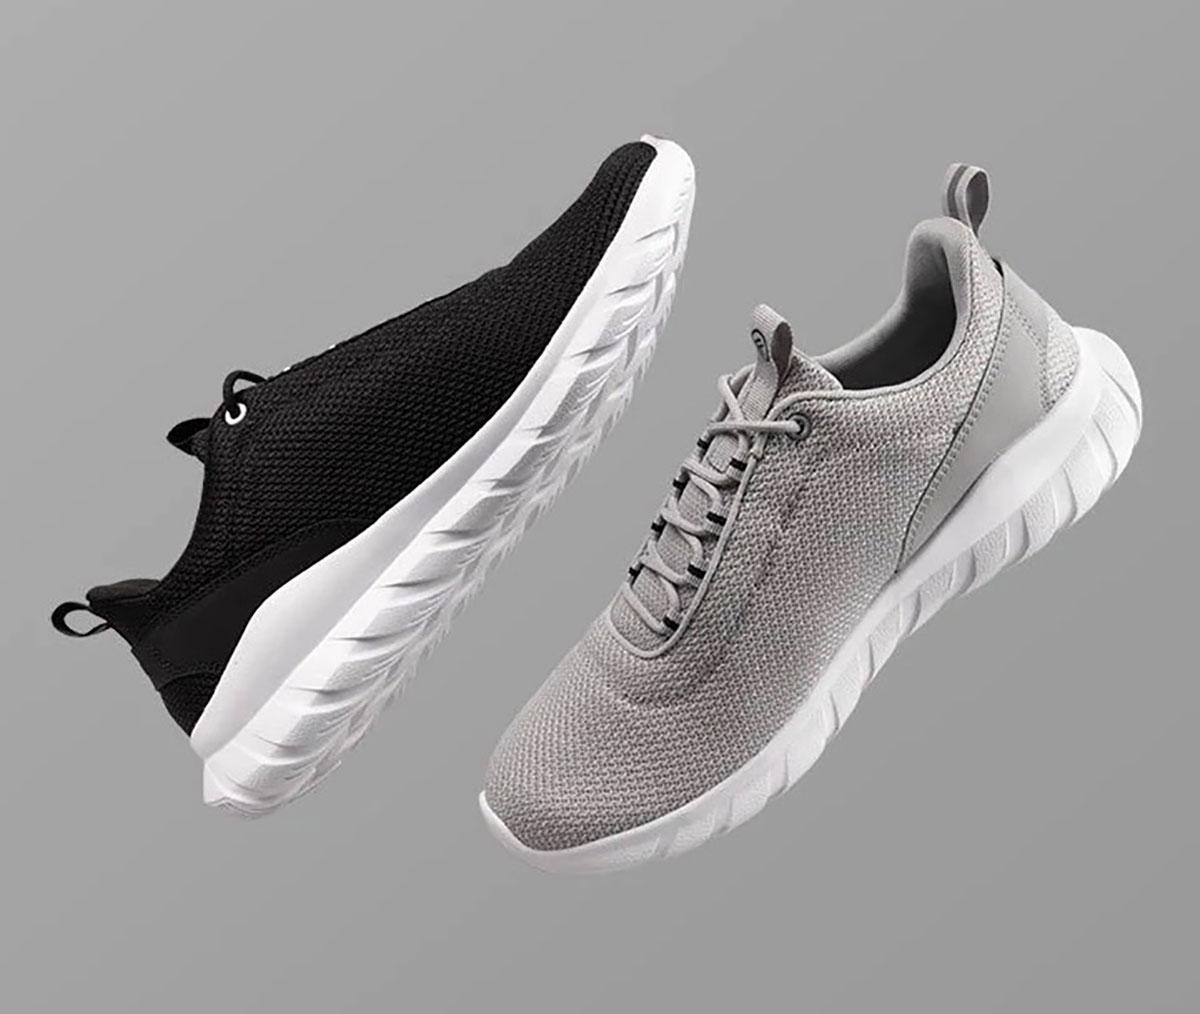 Les Xiaomi Youpin Freetie Sports Shoes